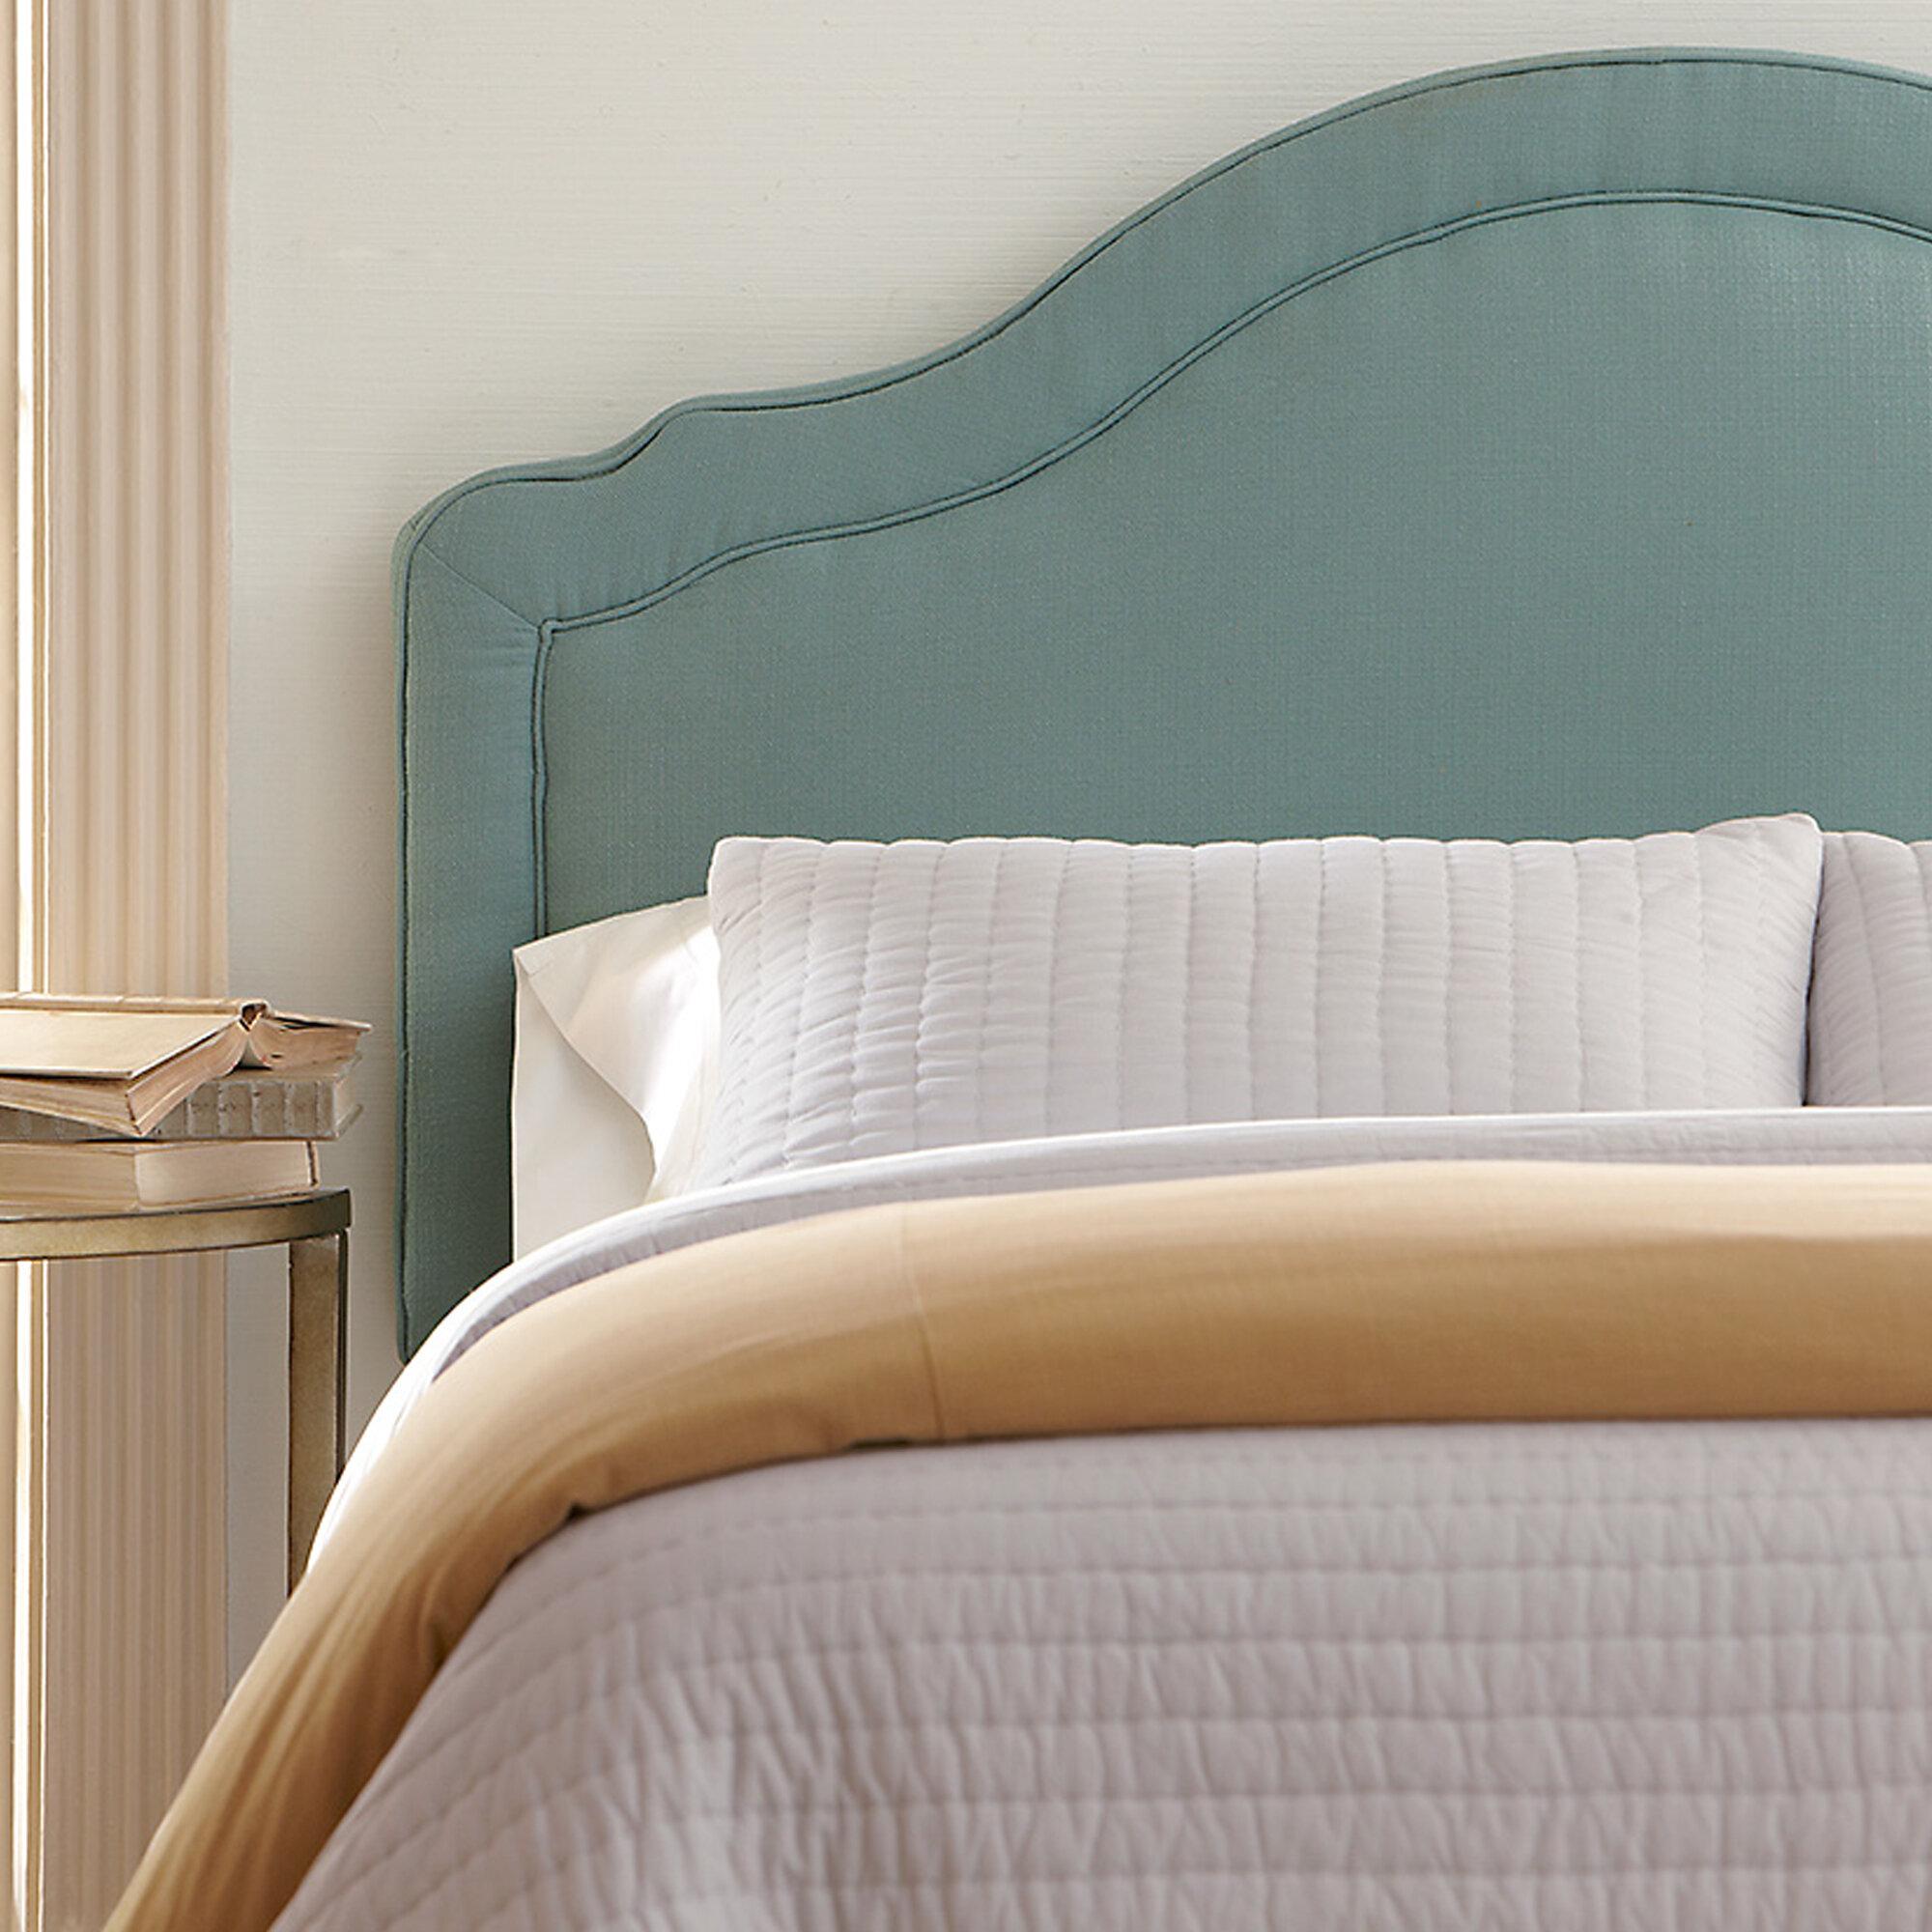 headboard wall upholstered headboards bedroom laura stein designer m lauramstein panels project huggers customer